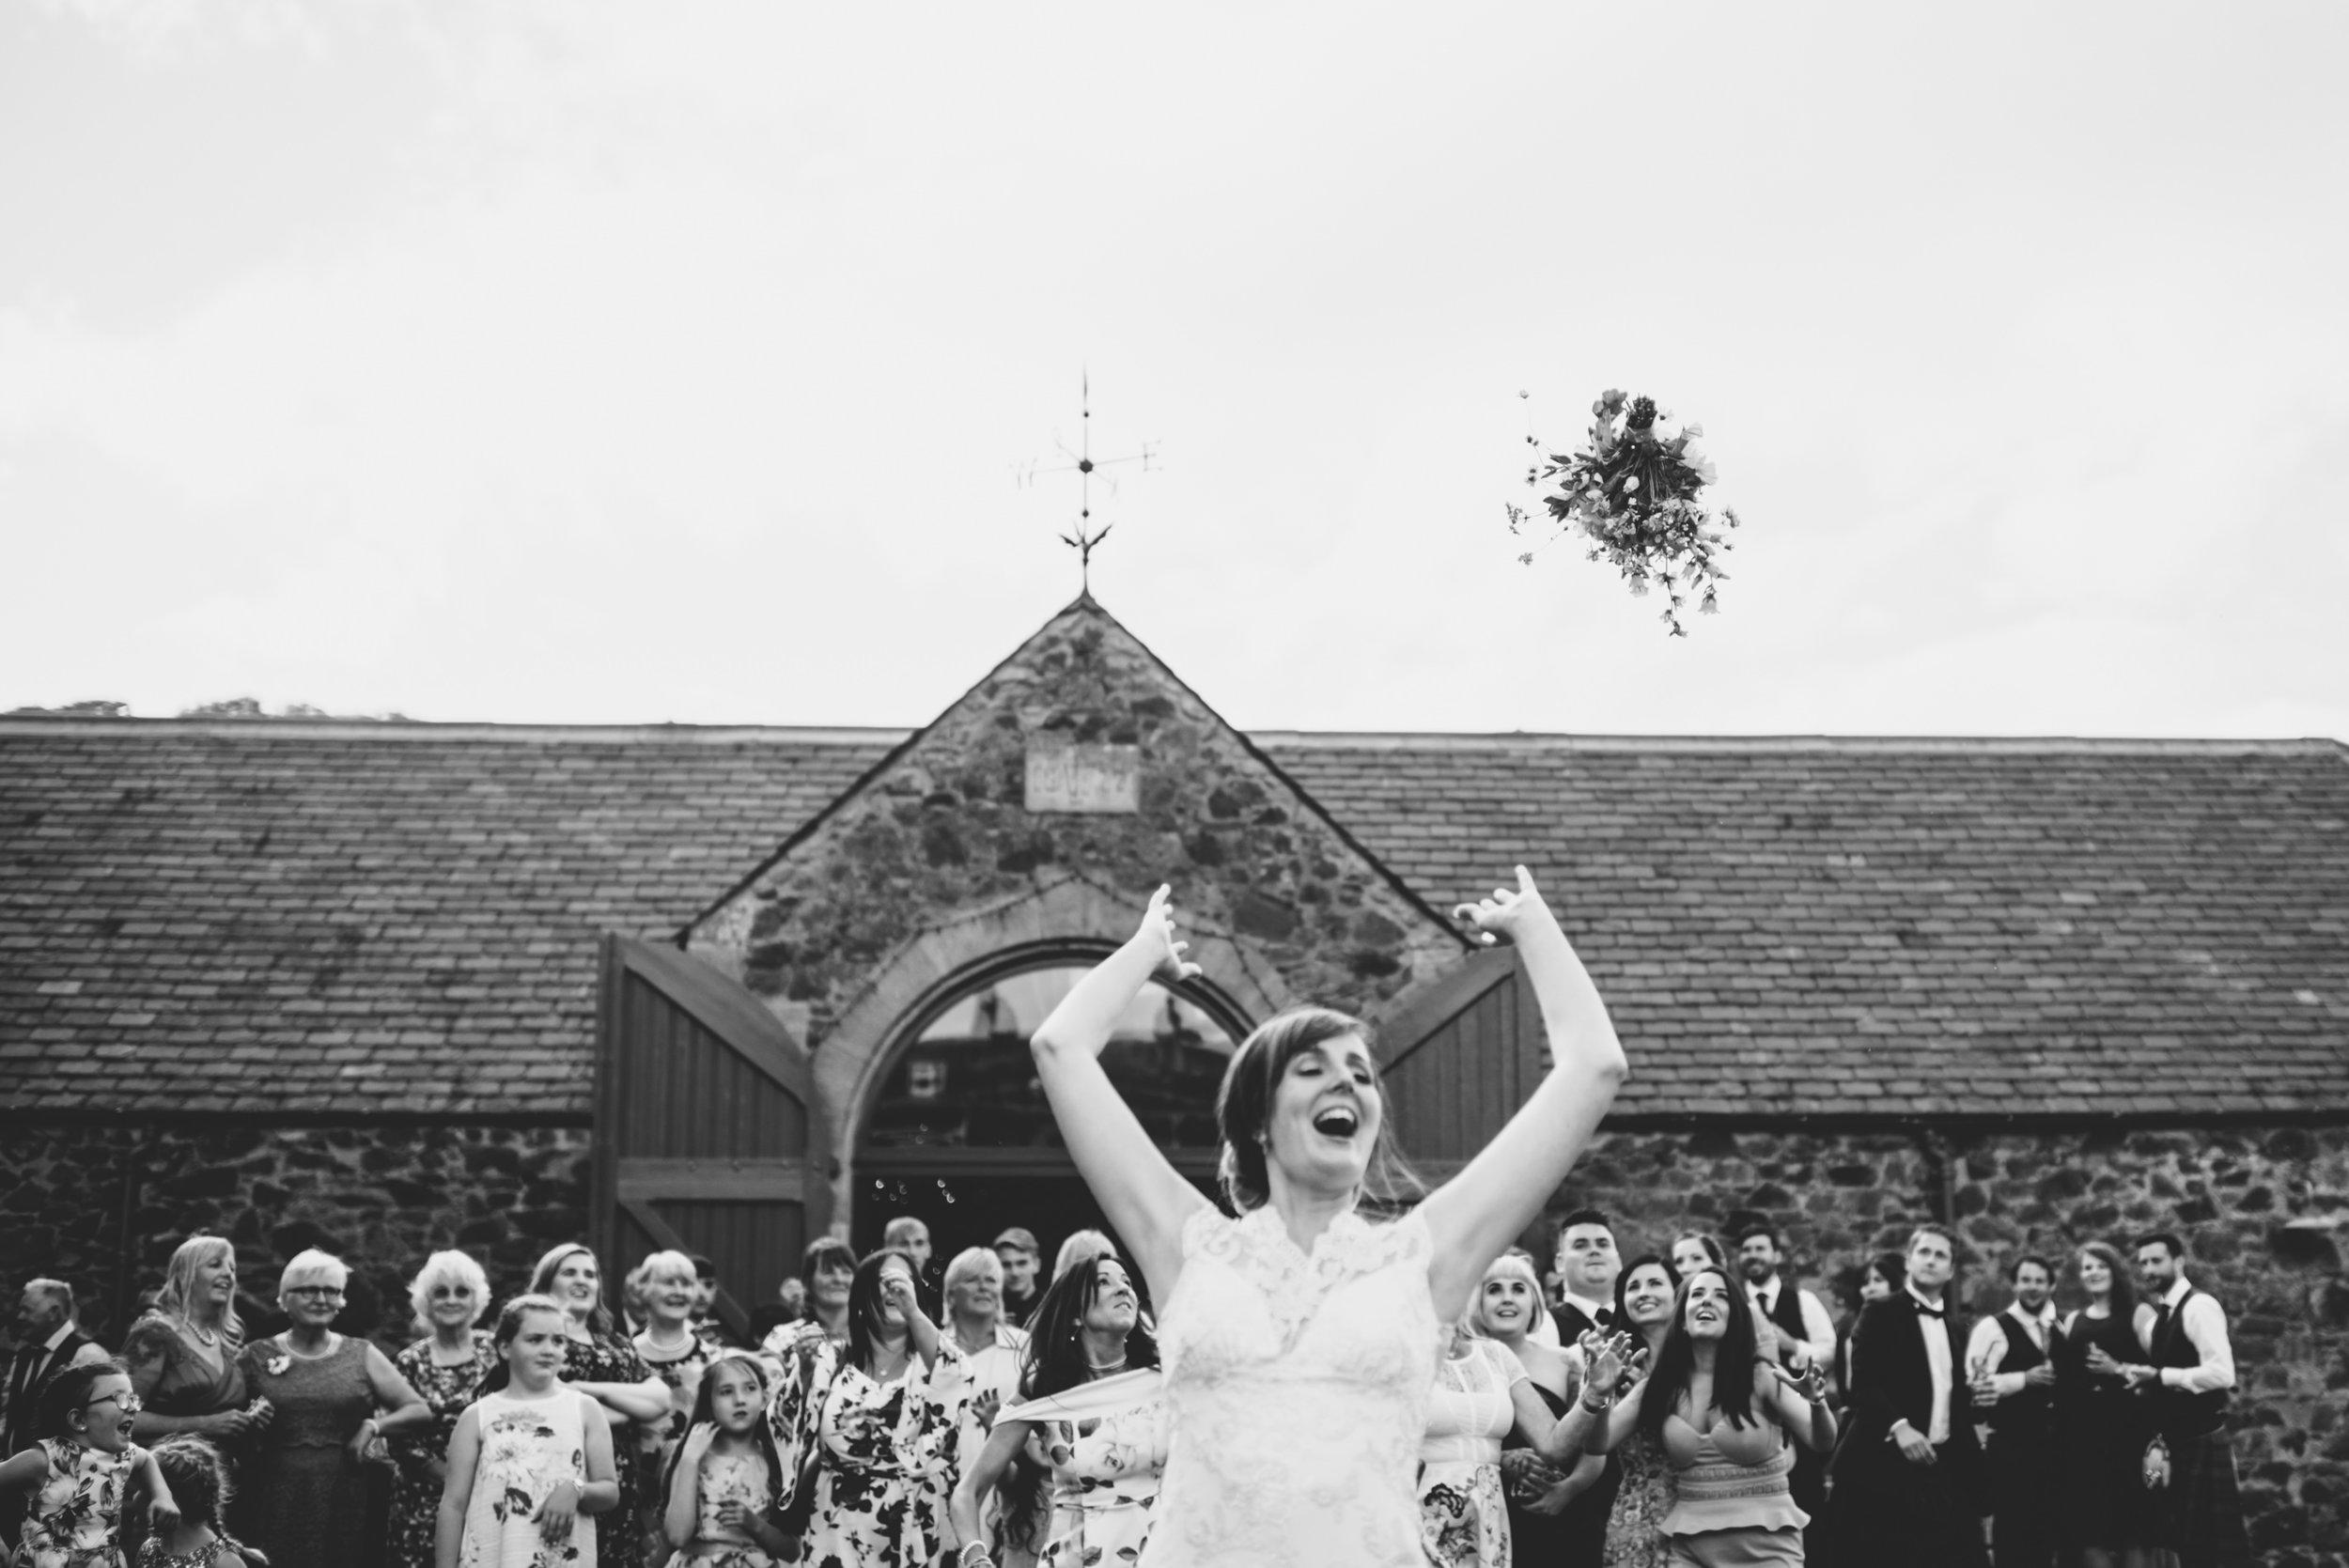 0059-LISA-DEVINE-PHOTOGRAPHY-ALTERNATIVE-WEDDING-PHOTOGRAPHY-SCOTLAND-DESTINATION-WEDDINGS-GLASGOW-WEDDINGS-COOL-WEDDINGS-STYLISH-WEDDINGS.JPG